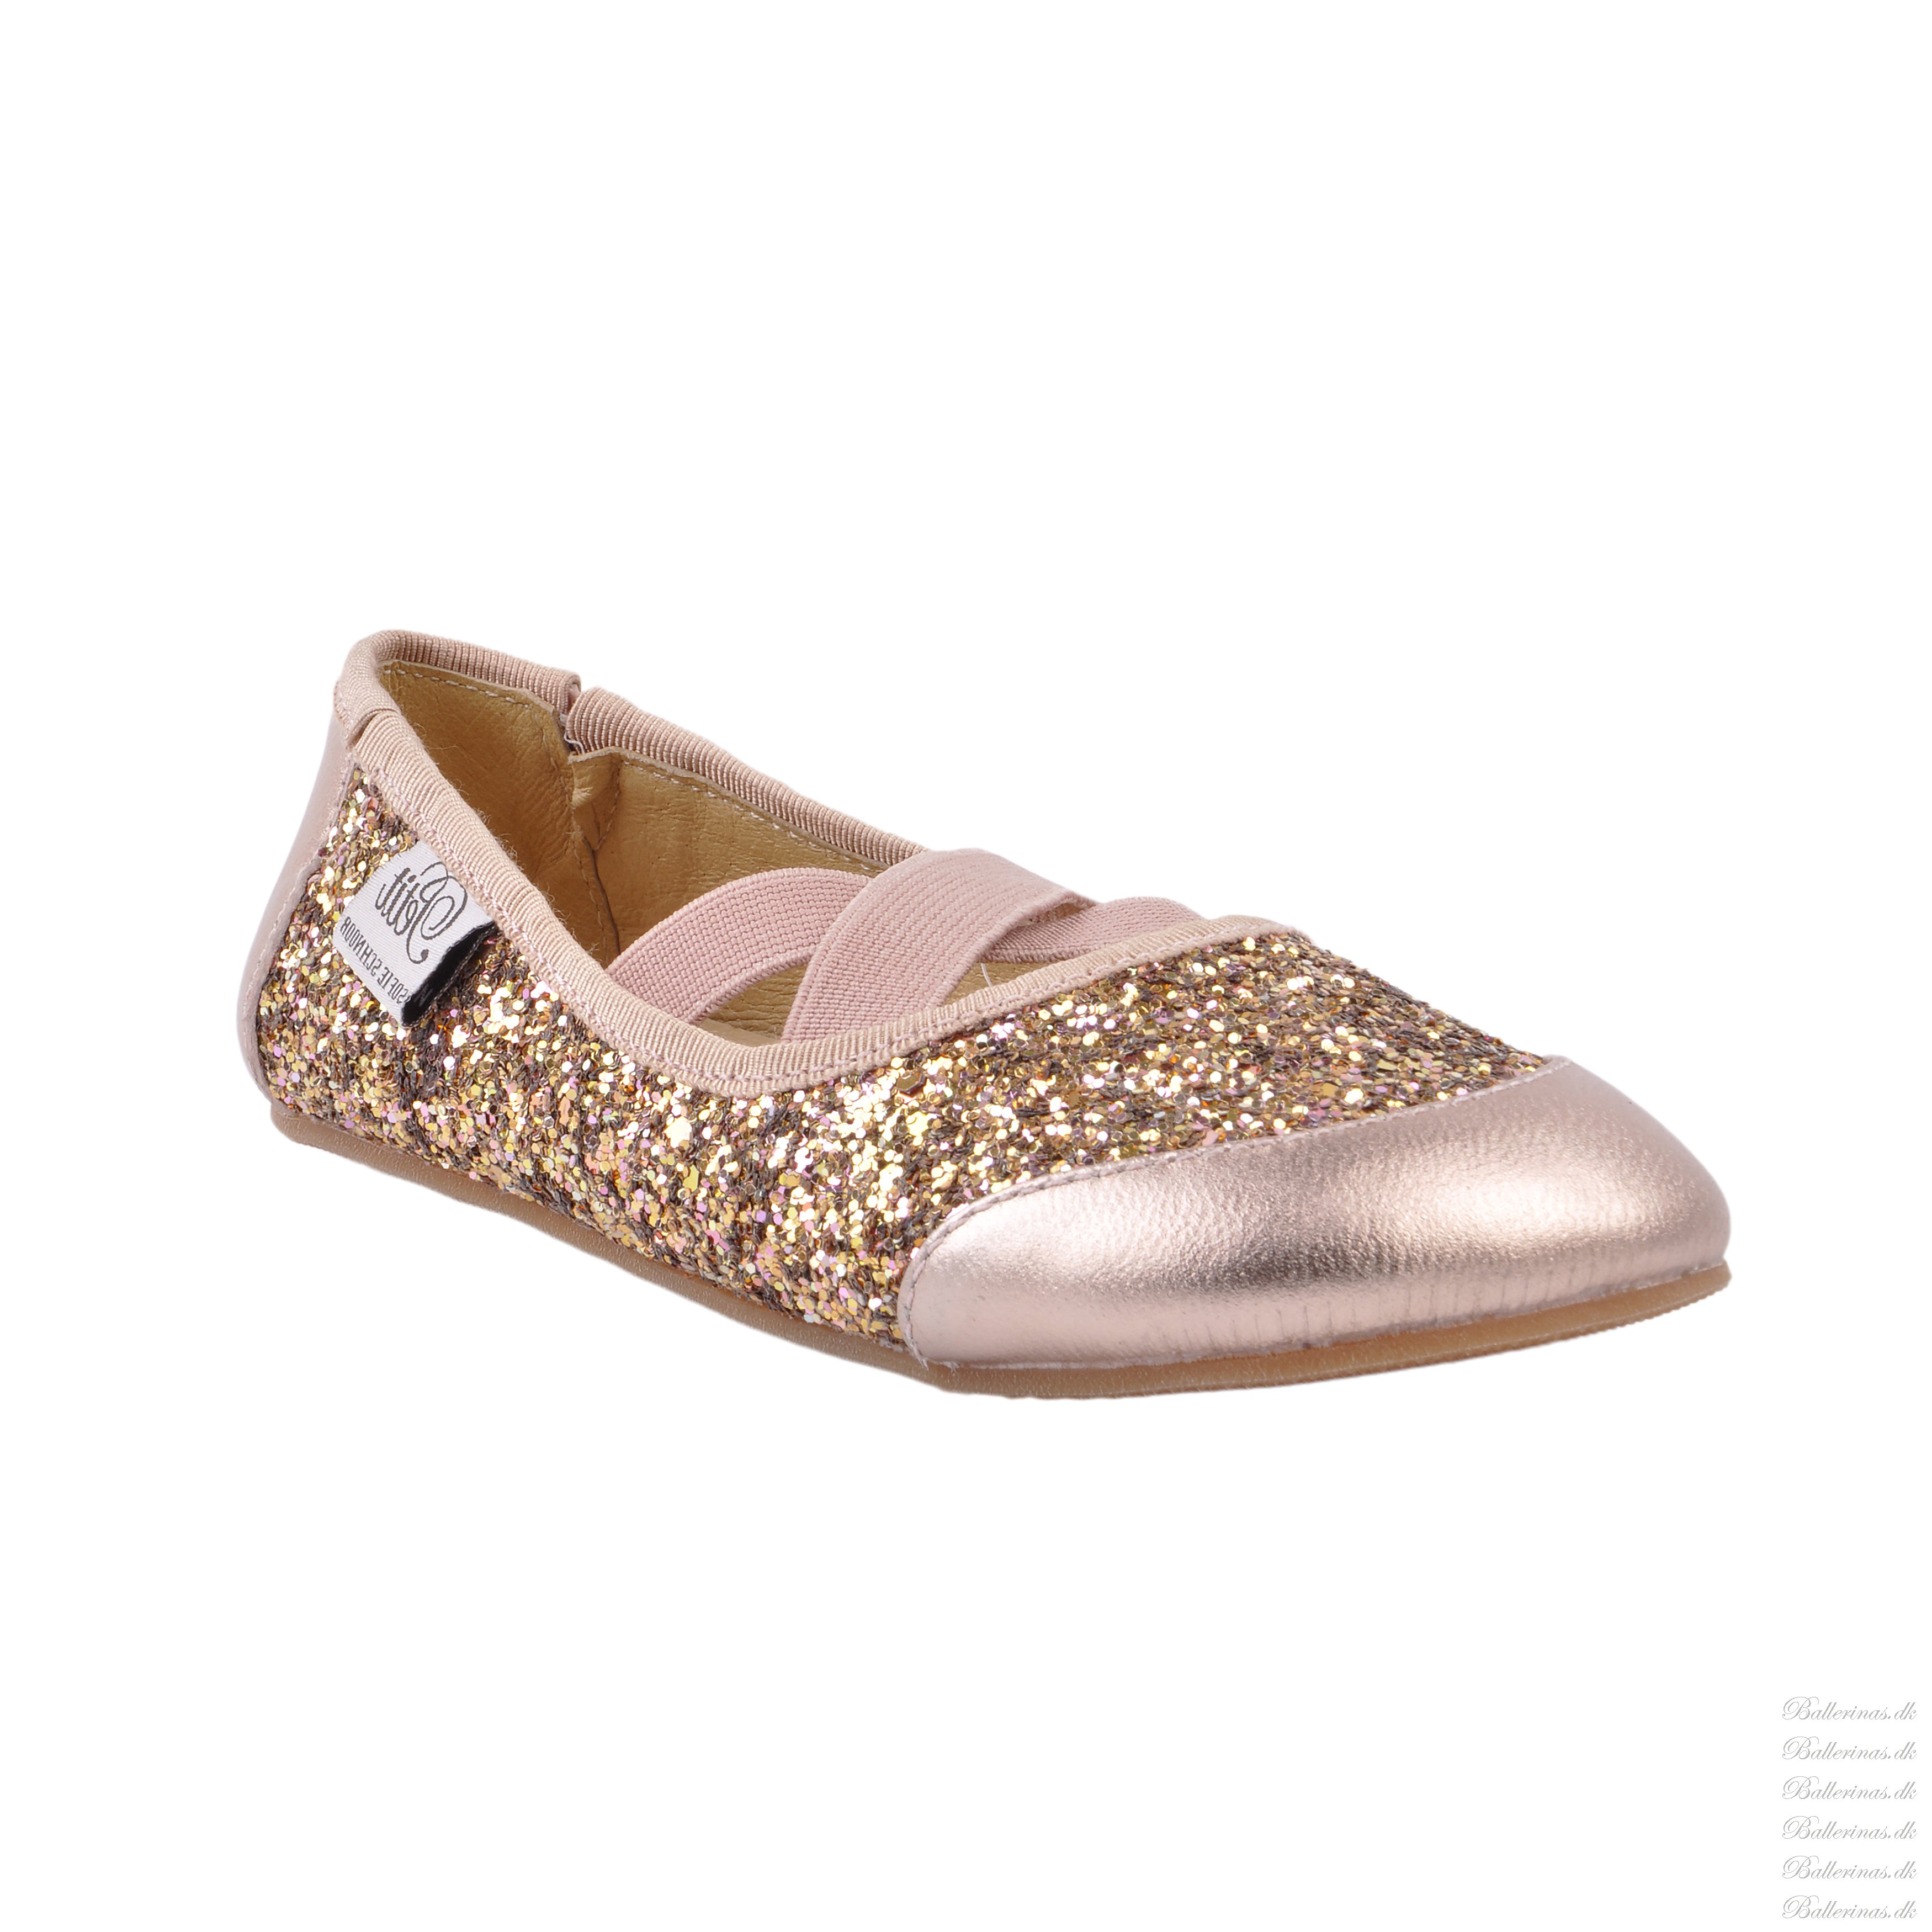 3cf76441229 Sofie Schnoor P816C Ballerina Indesko Rosegold - Innendørs sko -  Blinkesko.no